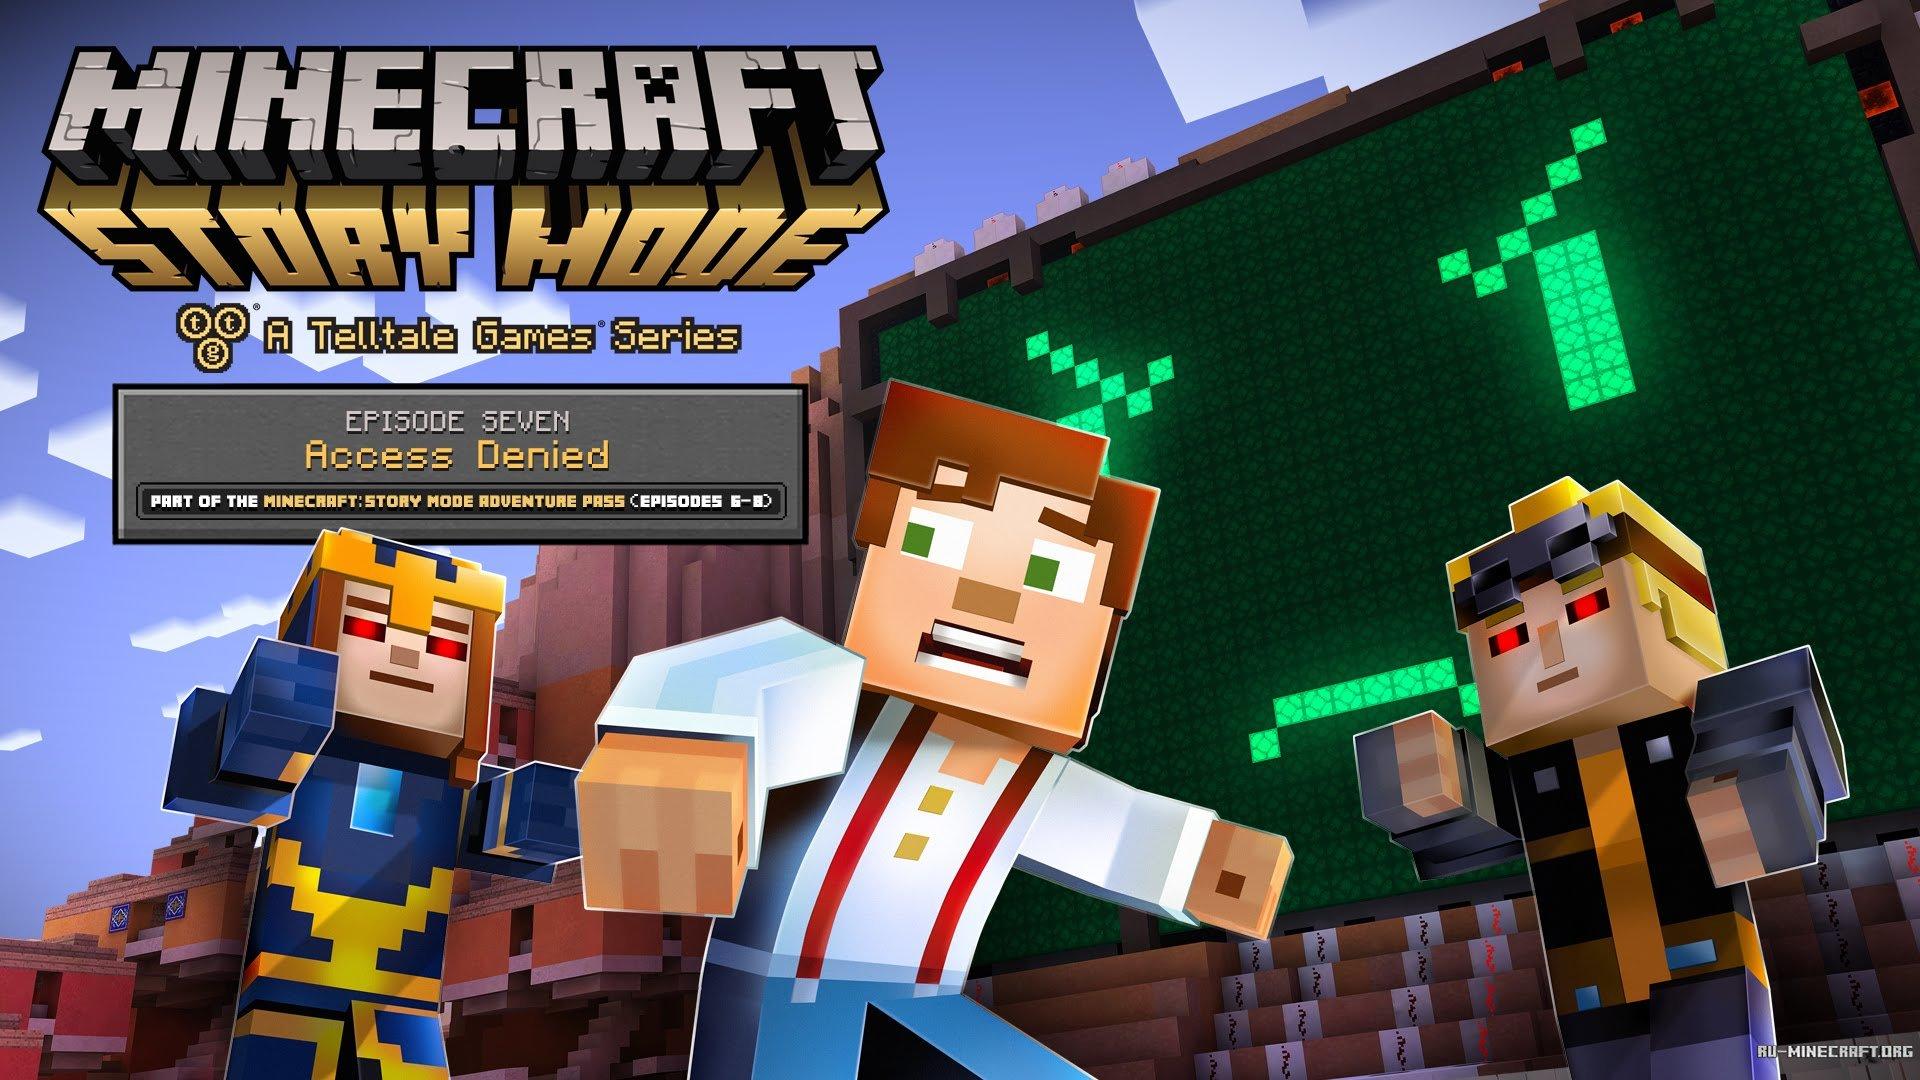 Скачать мод на майнкрафт minecraft story mode